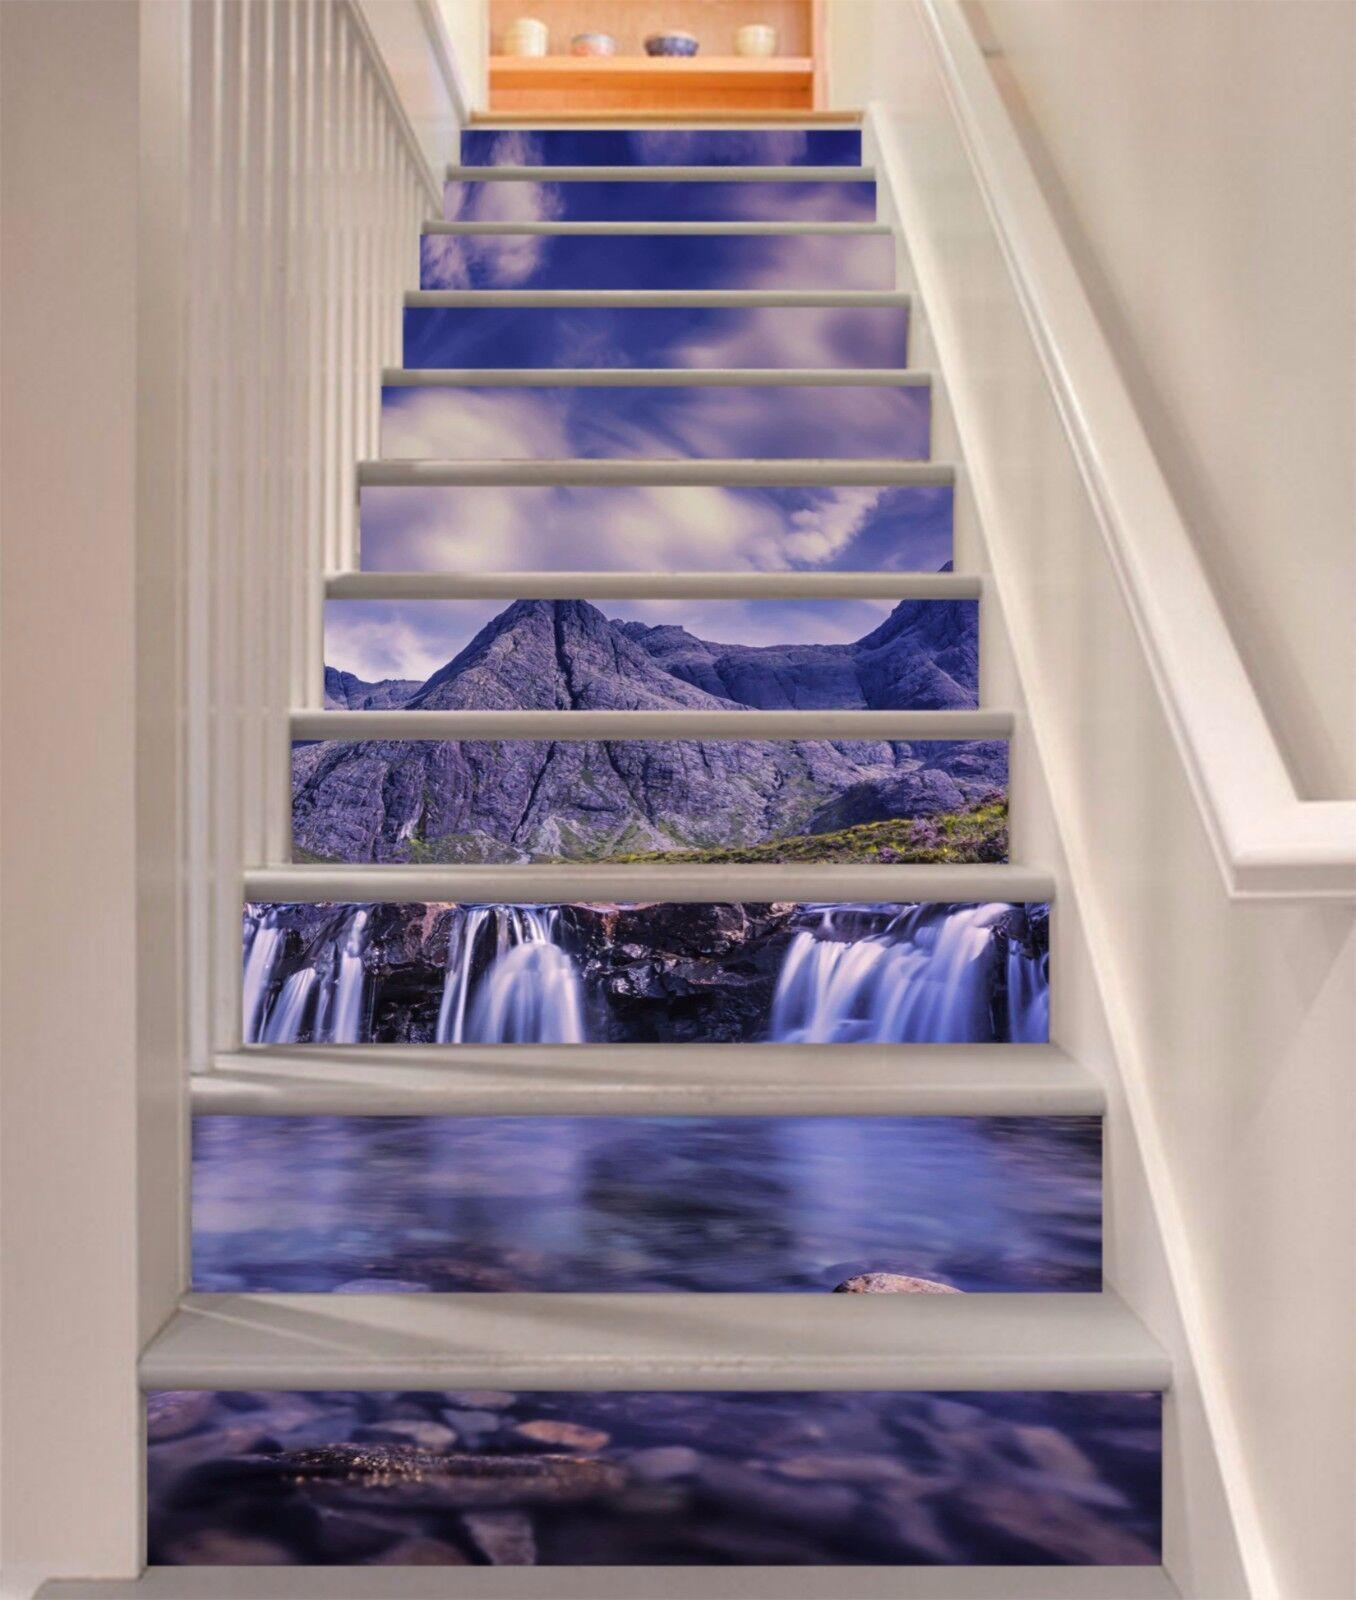 3D Sky mountain 3 Stair Risers Decoration Photo Mural Vinyl Decal Wallpaper UK